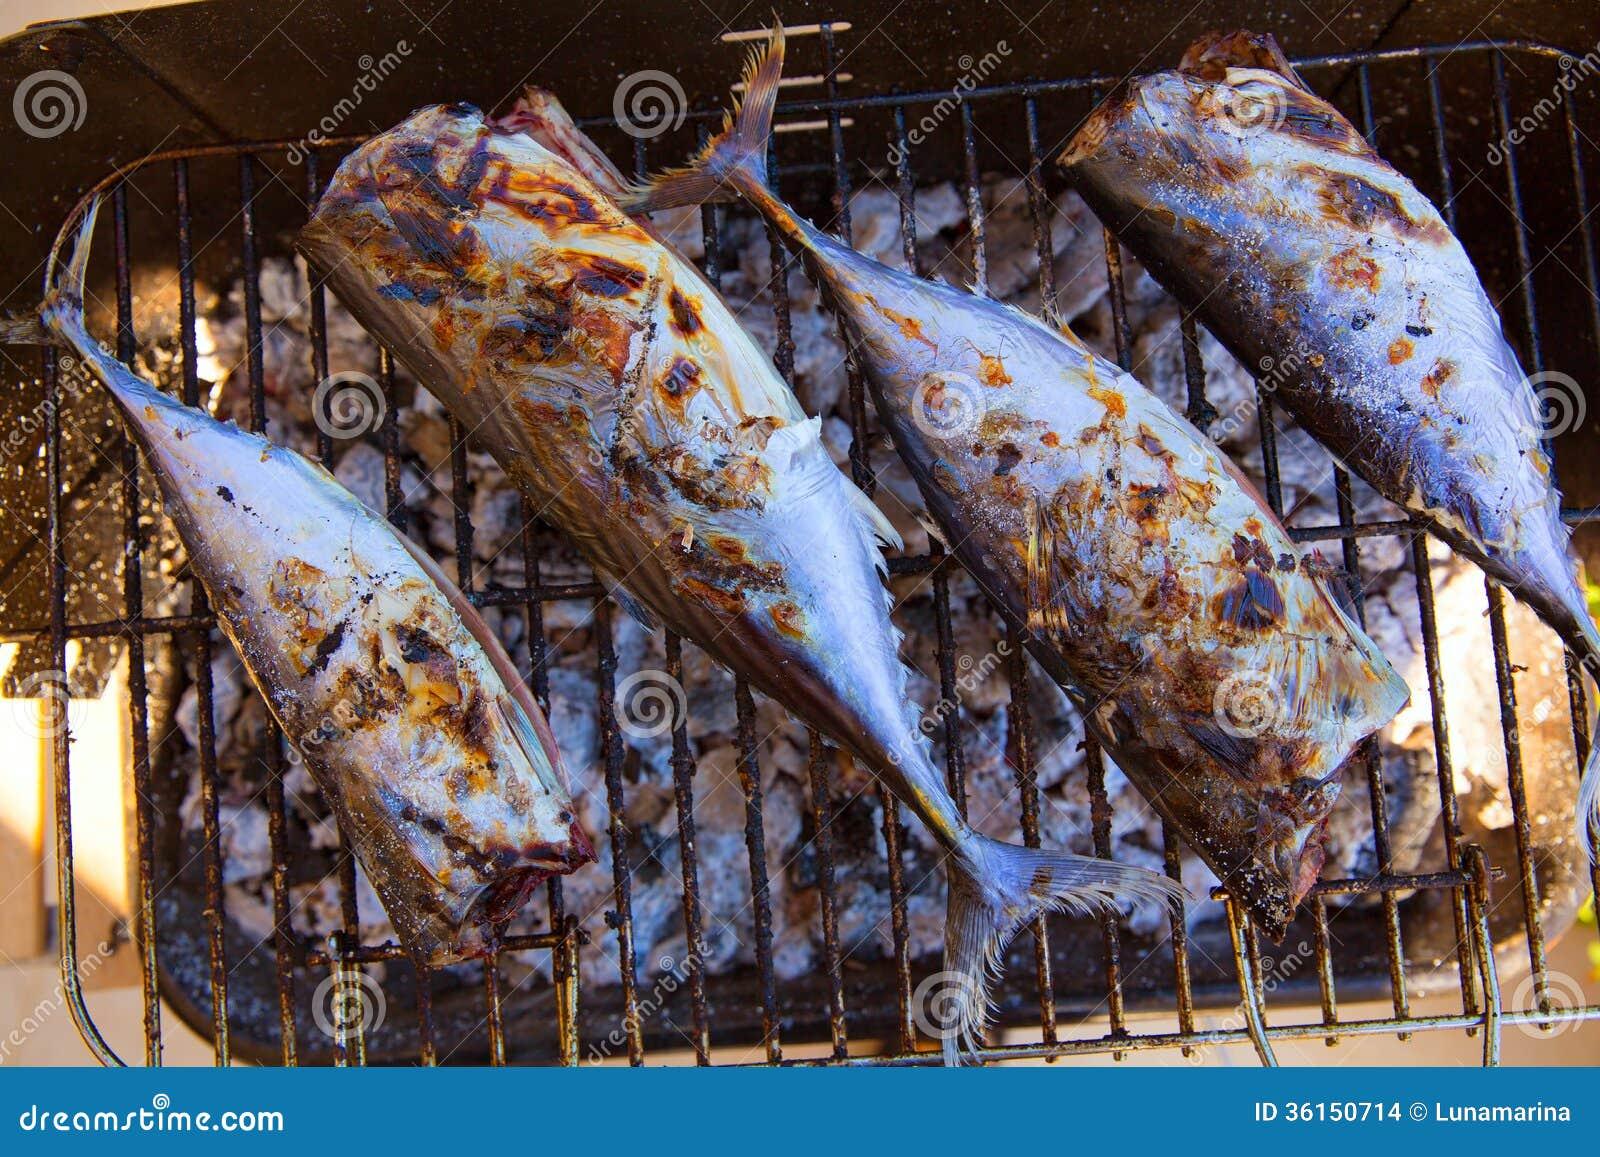 Tuna Fish Barbecue With Bonito Sarda And Little Tunny